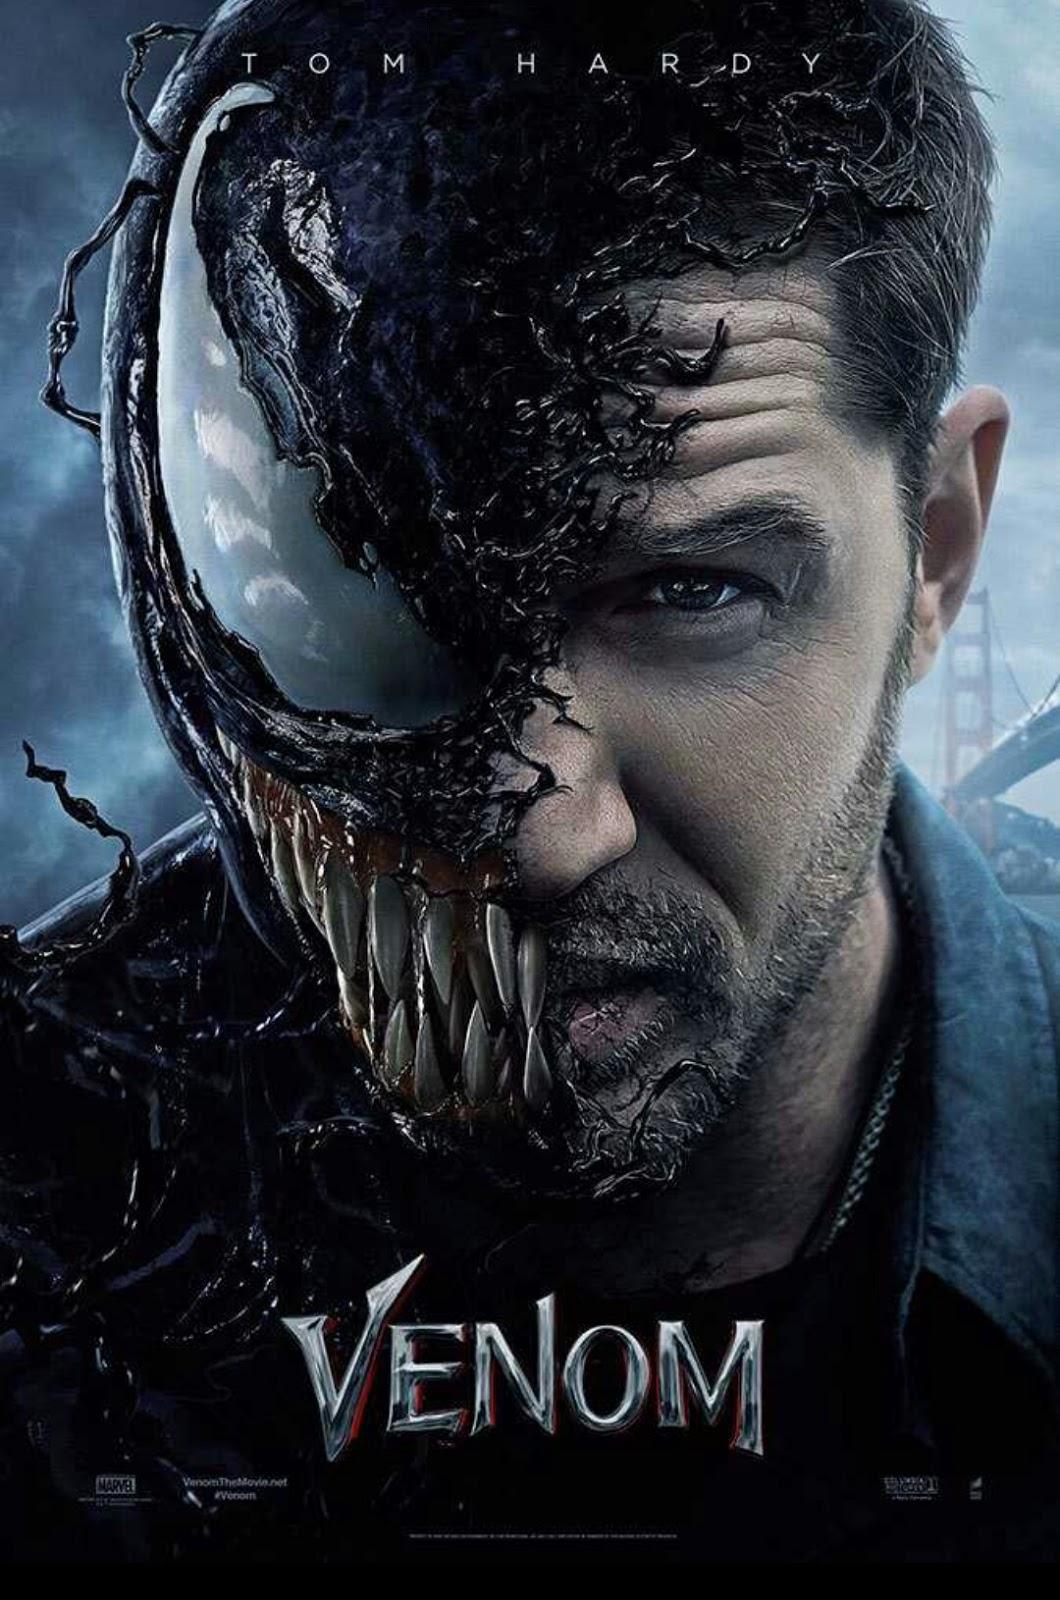 Movies Era Venom Hindi Dubbed 2018 Hollywood Movie Download